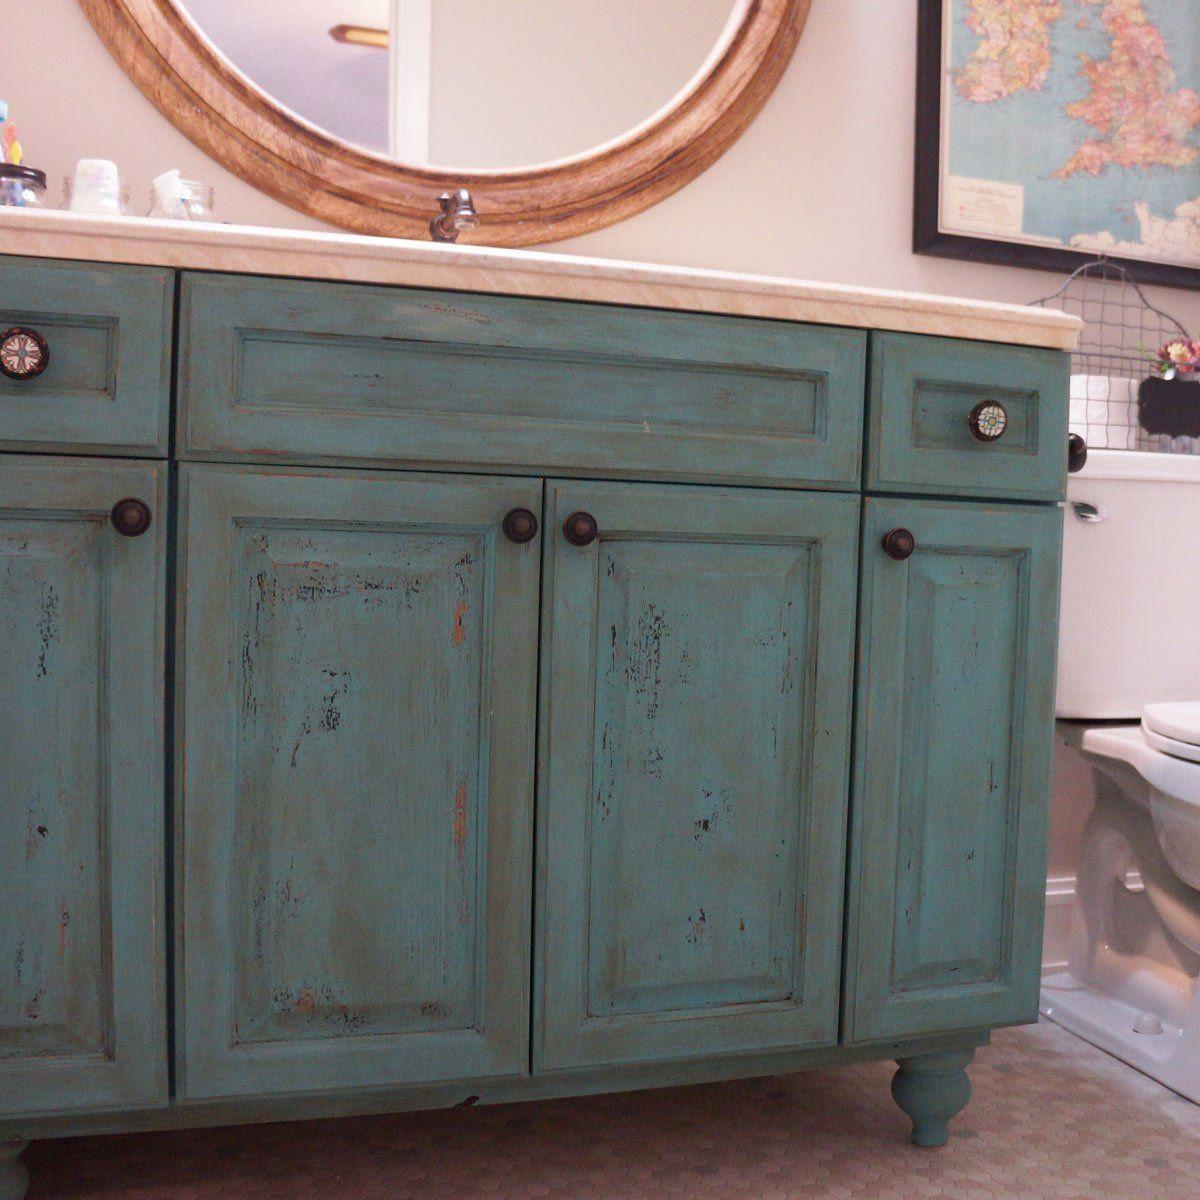 bathroom vanities and sink combo bathroom vanities on bathroom vanity cabinets clearance id=25459